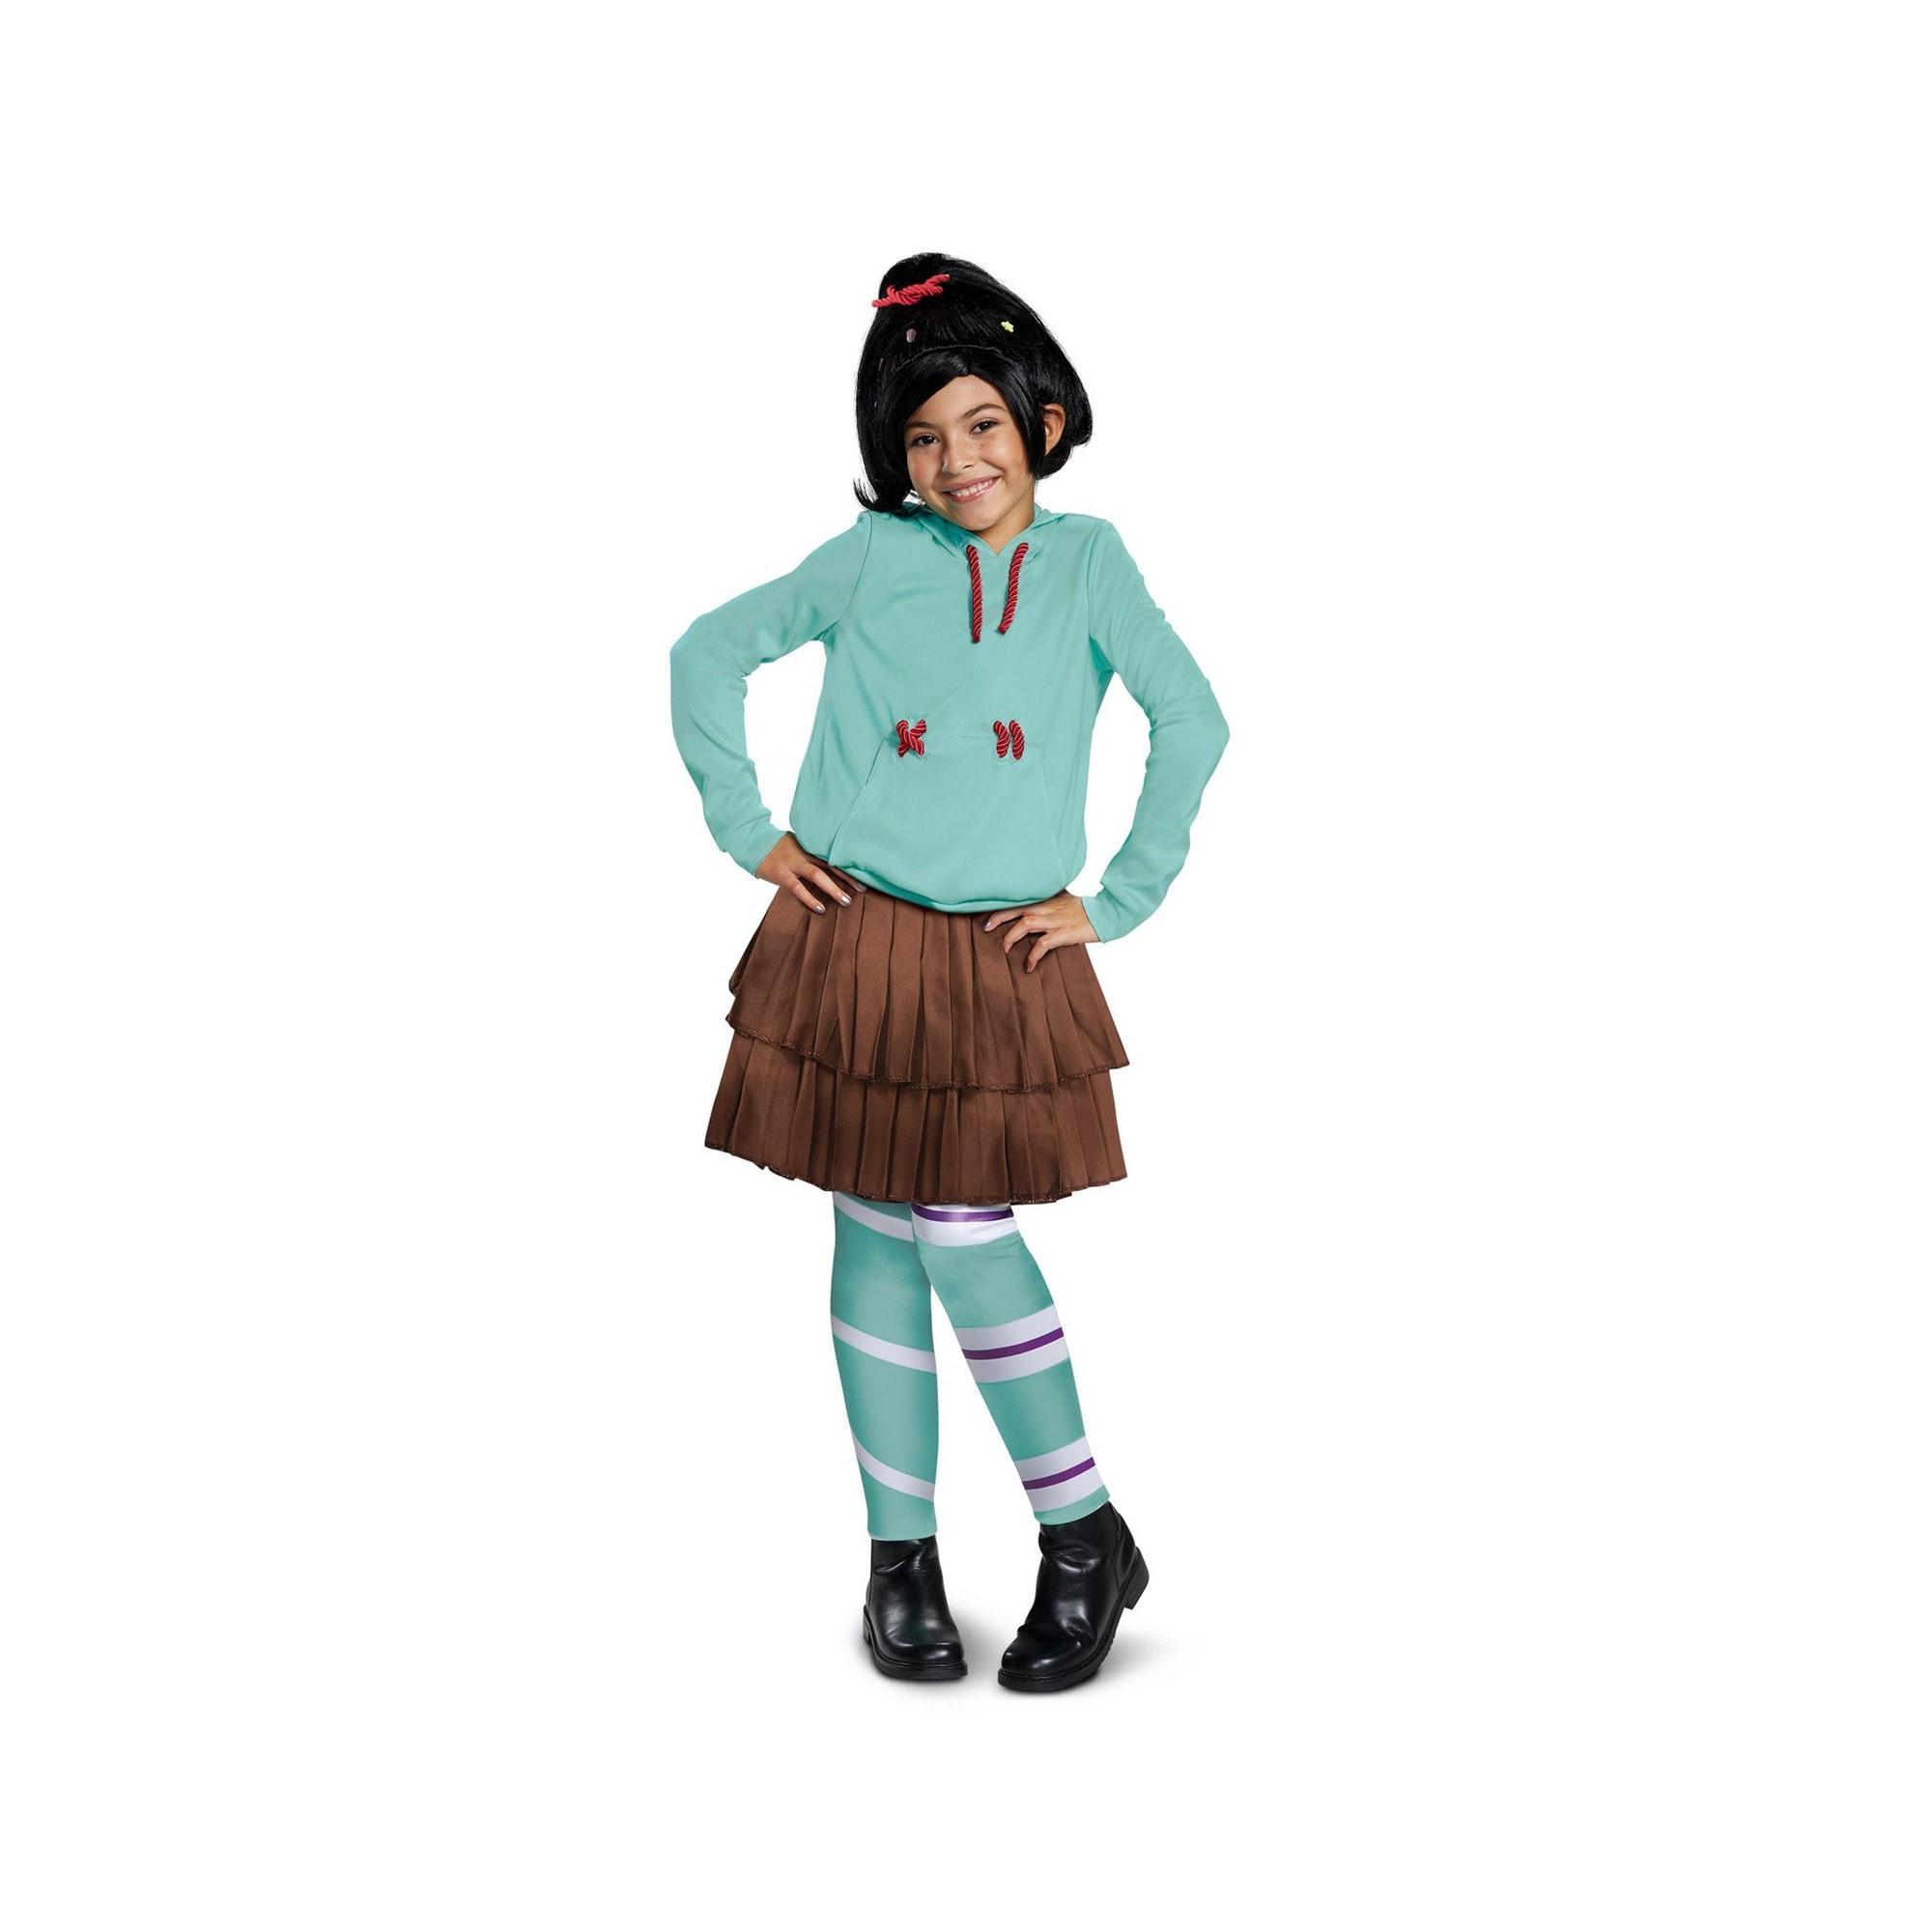 Wreck-It Ralph 2 Girls' Vanelope Deluxe Halloween Costume M - Disguise, Multicolored